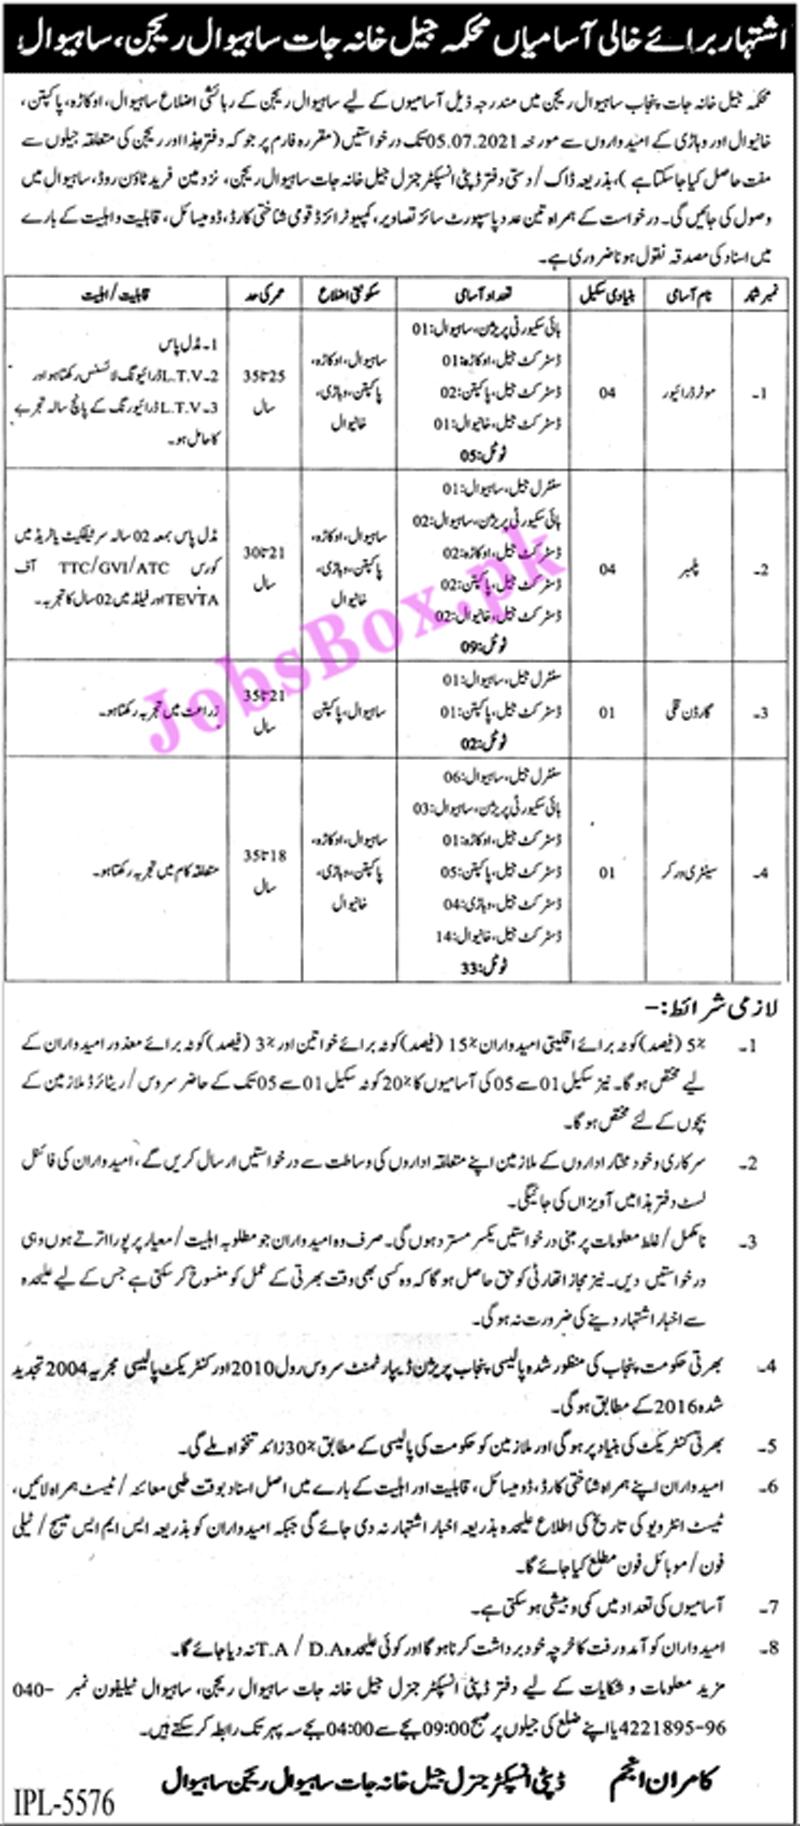 Prison Department Punjab Jobs 2021 - Jail Khana Jat Sahiwal Region Jobs